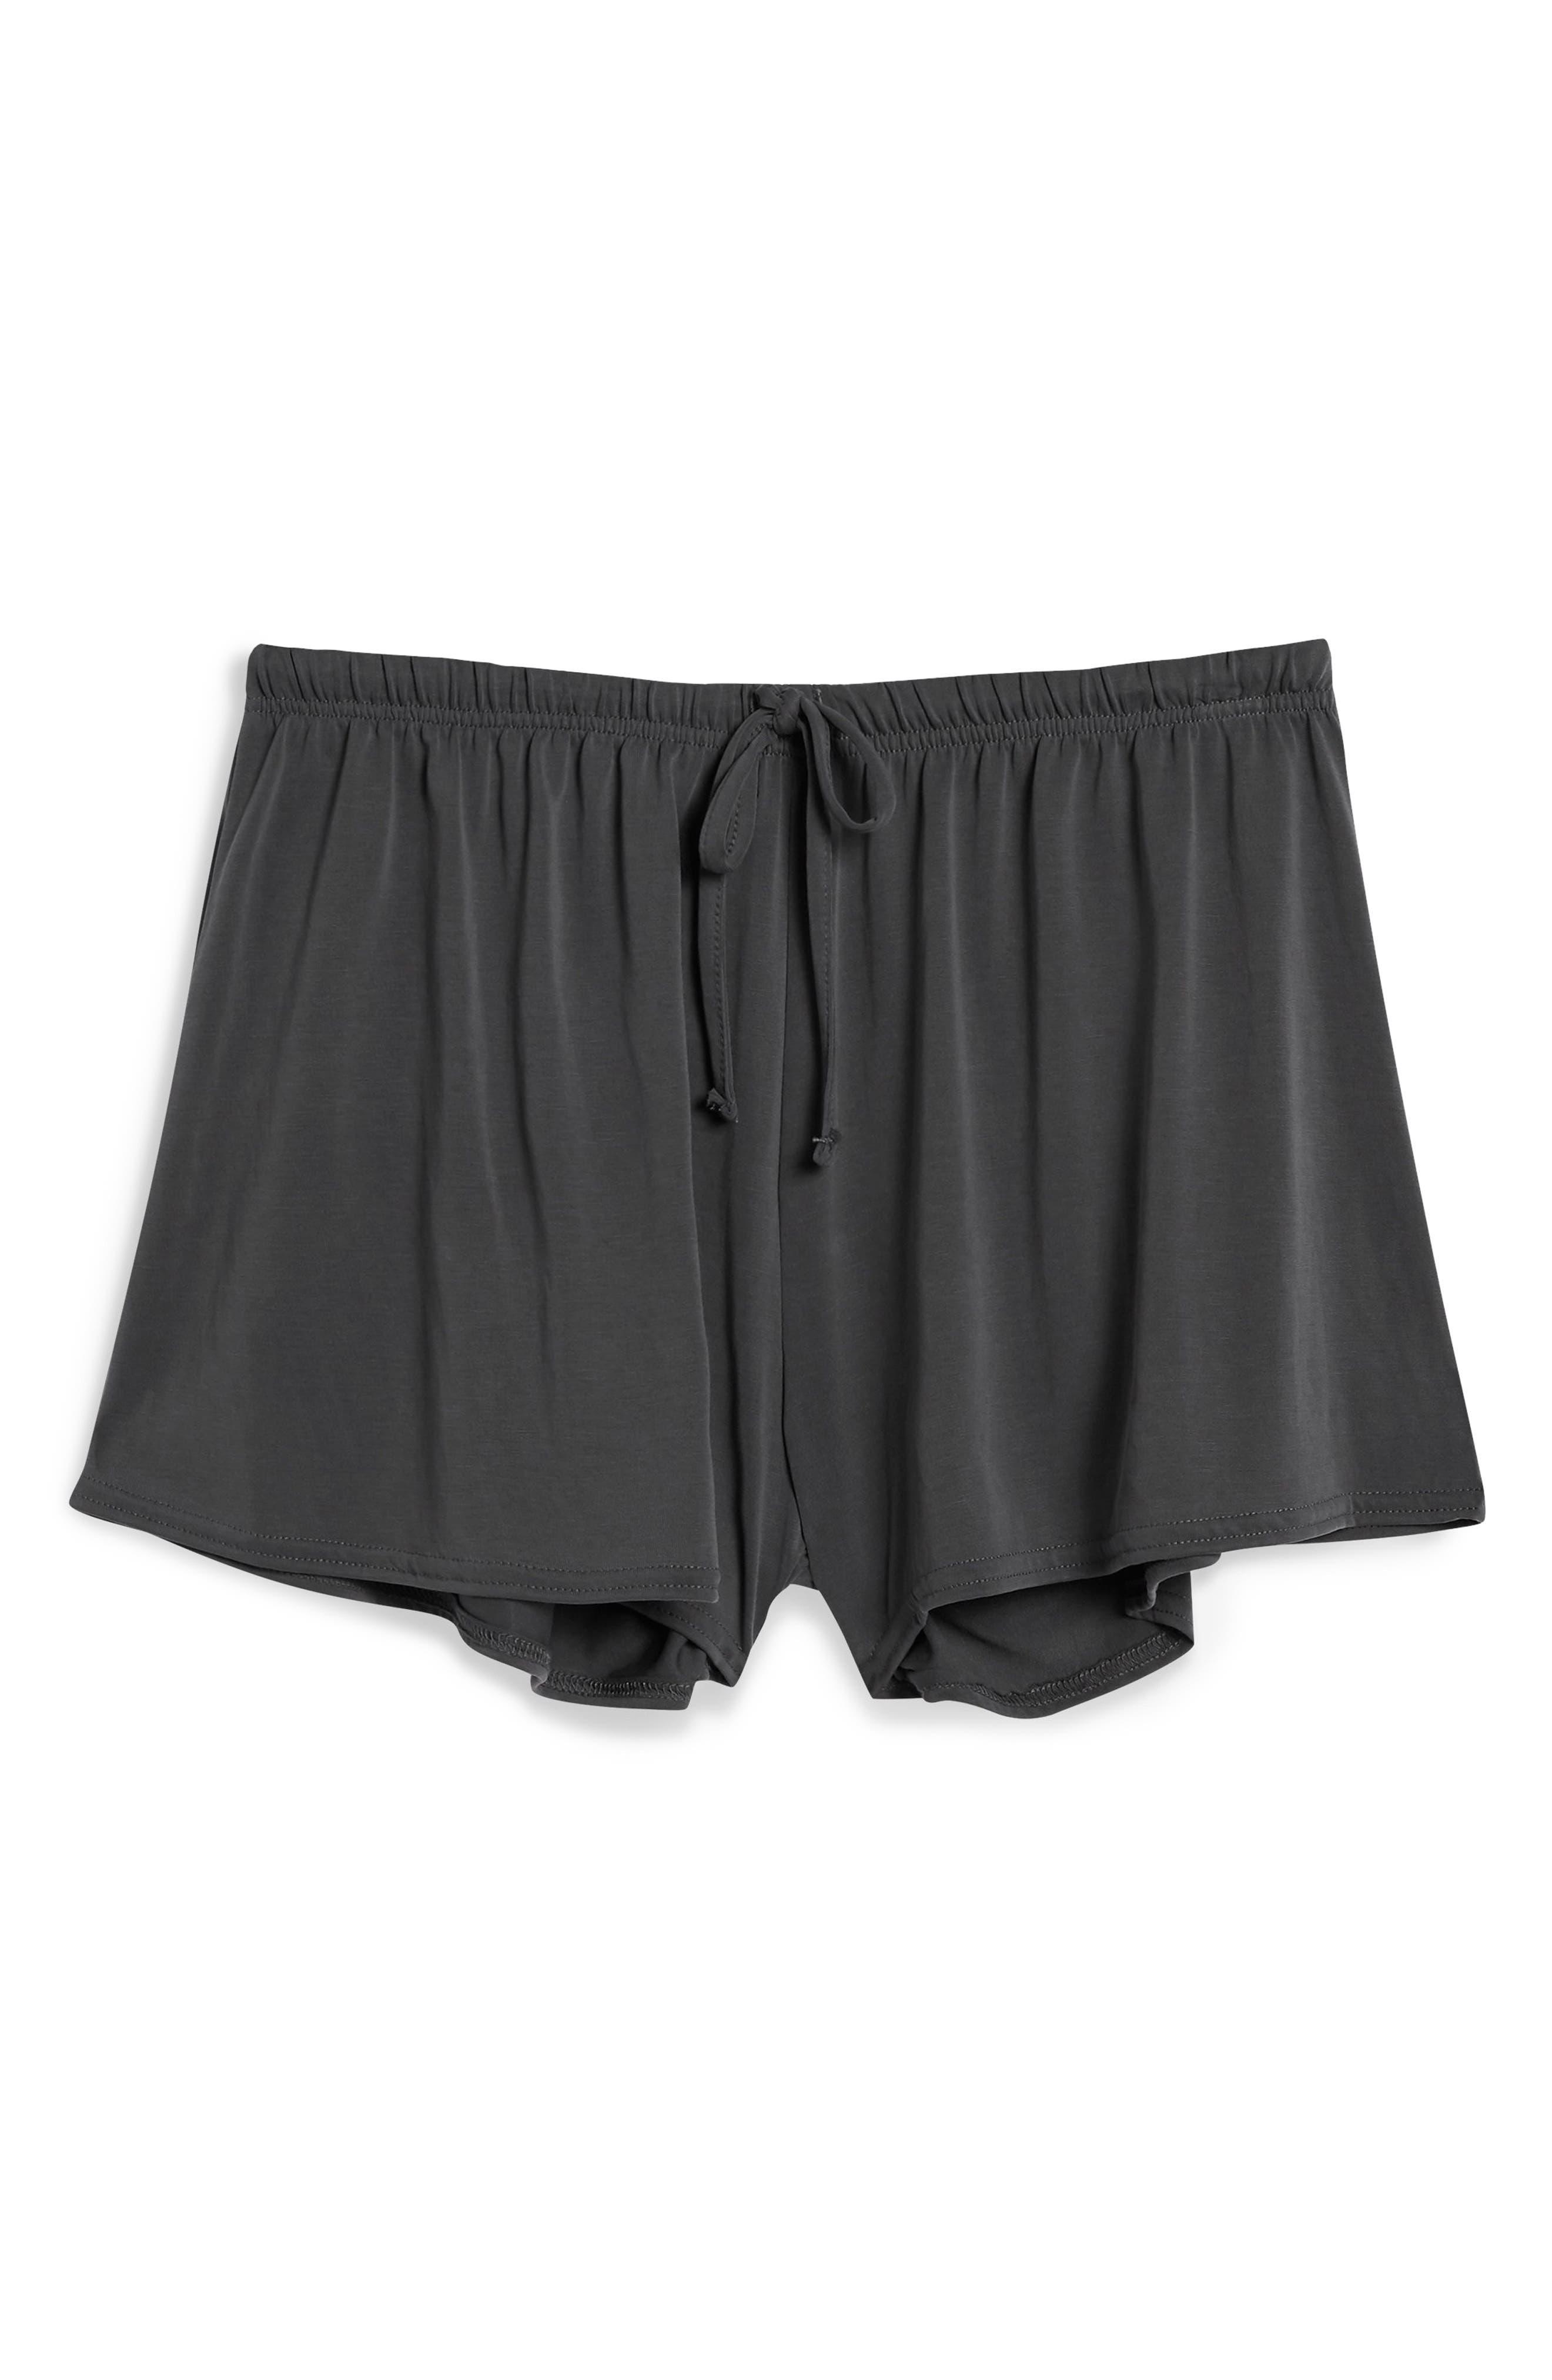 Lounge Shorts,                             Alternate thumbnail 3, color,                             GREY